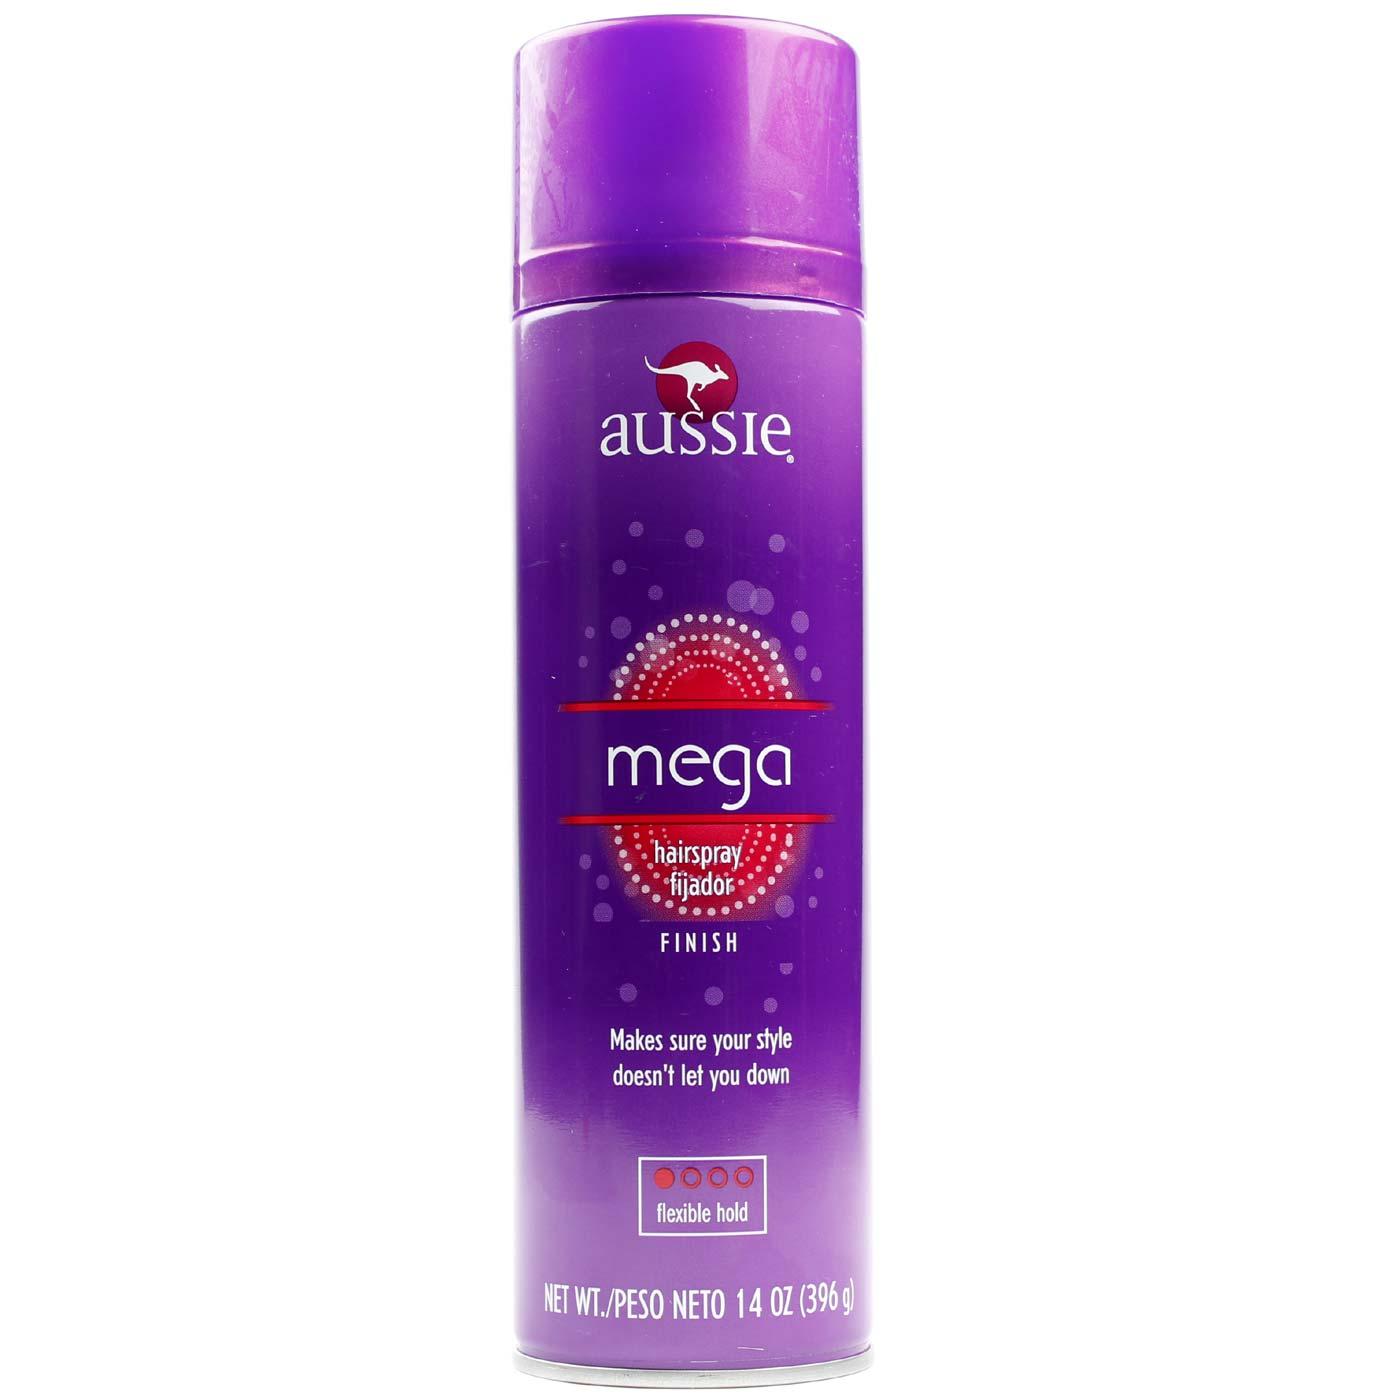 Aussie Mega Hairspray 14 Oz Evitamins Com